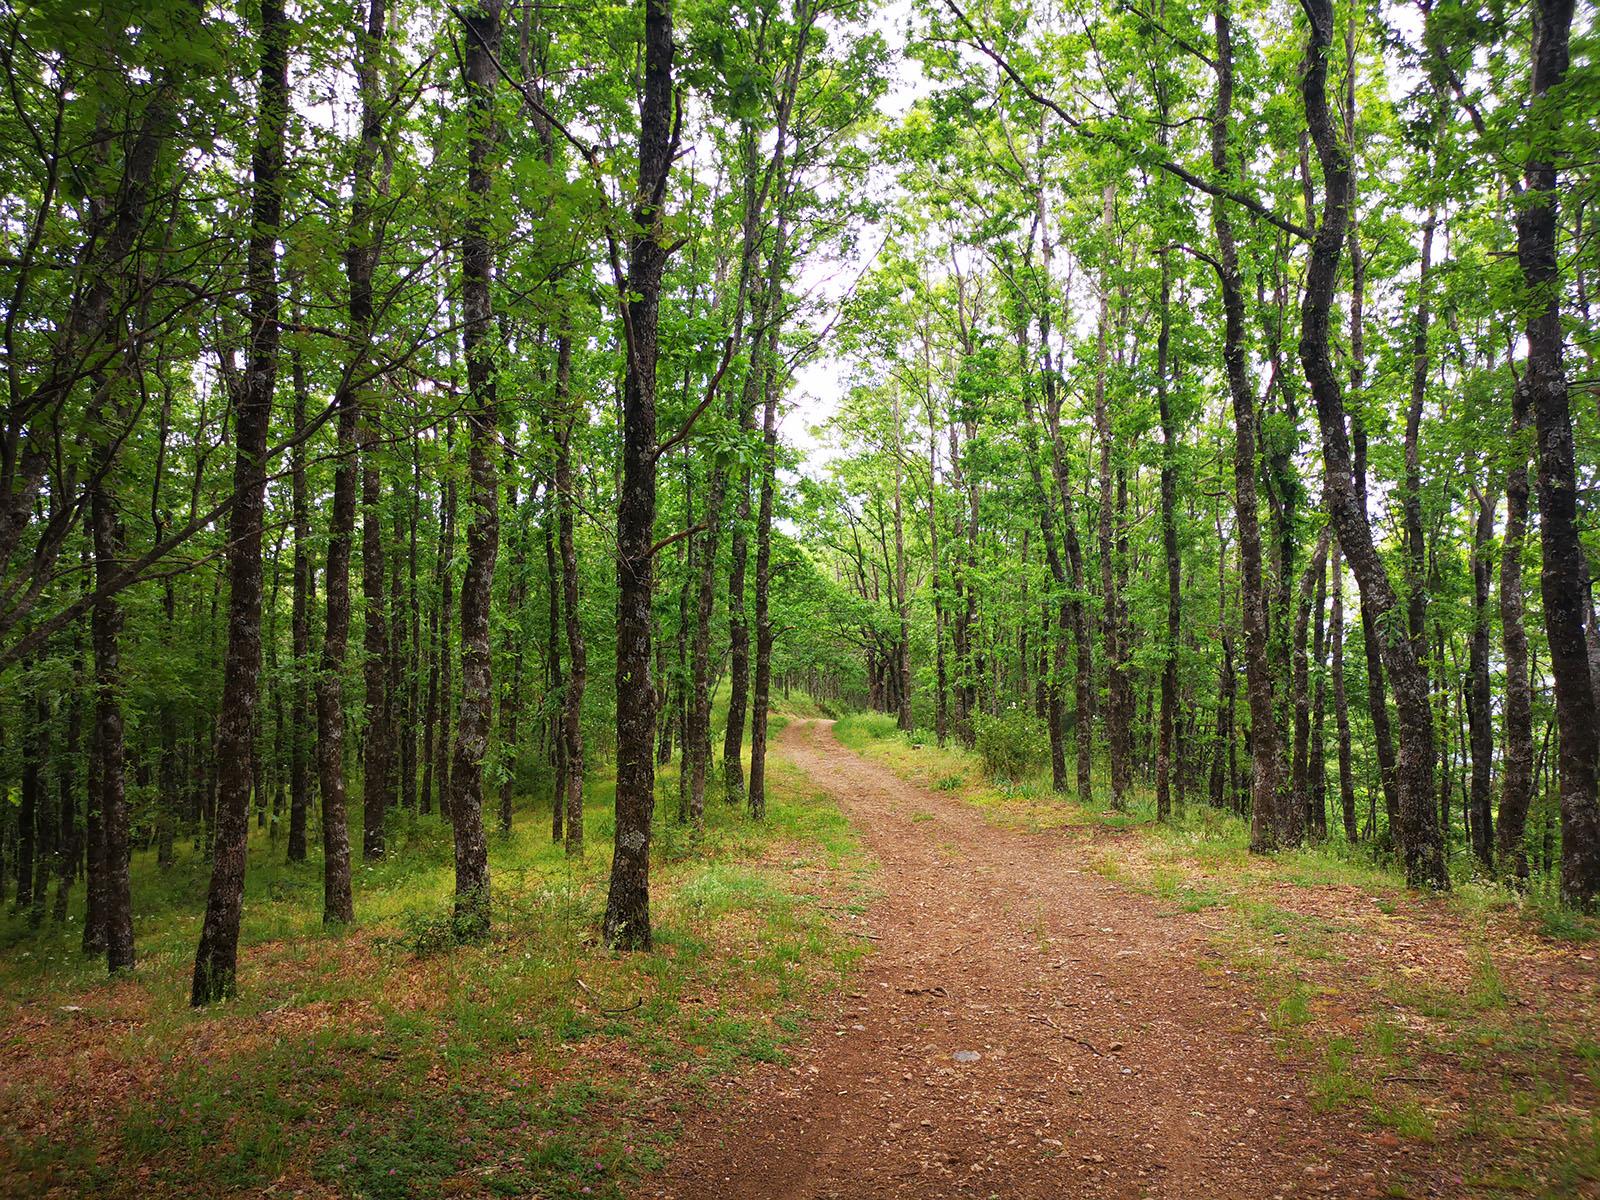 Cammino Basiliano: Oak trees' trail